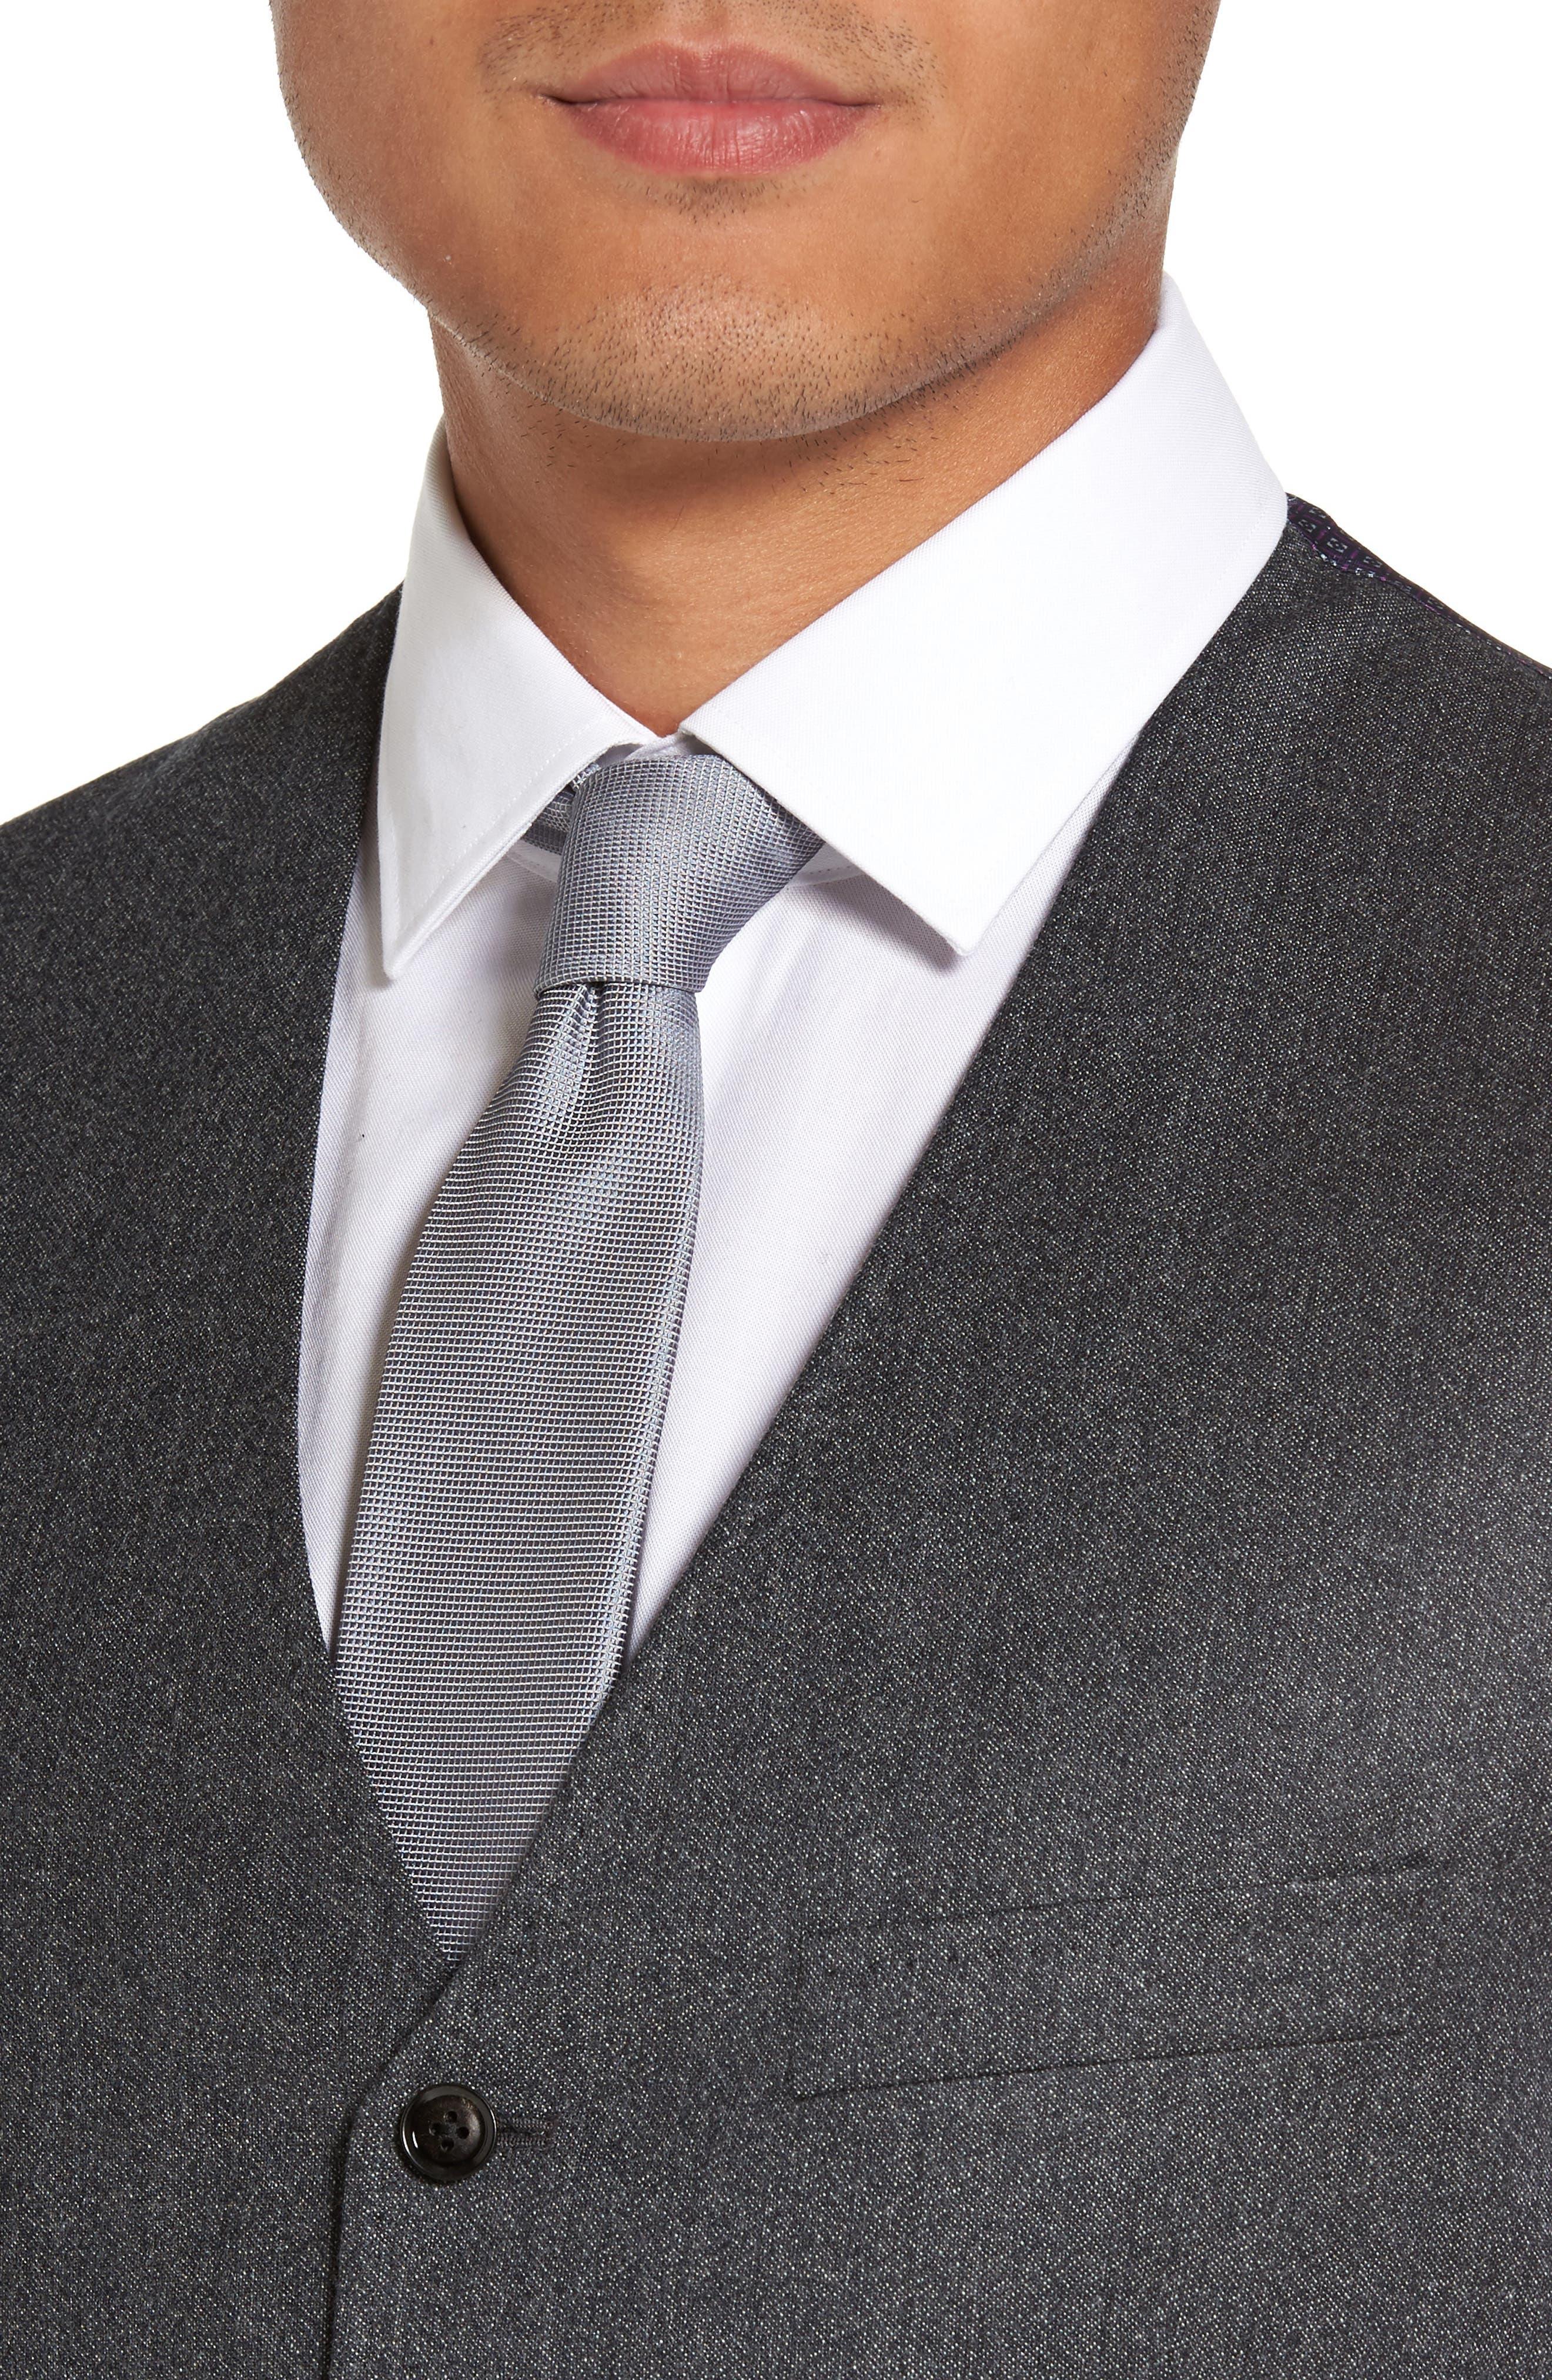 Troy Trim Fit Solid Wool Vest,                             Alternate thumbnail 4, color,                             050